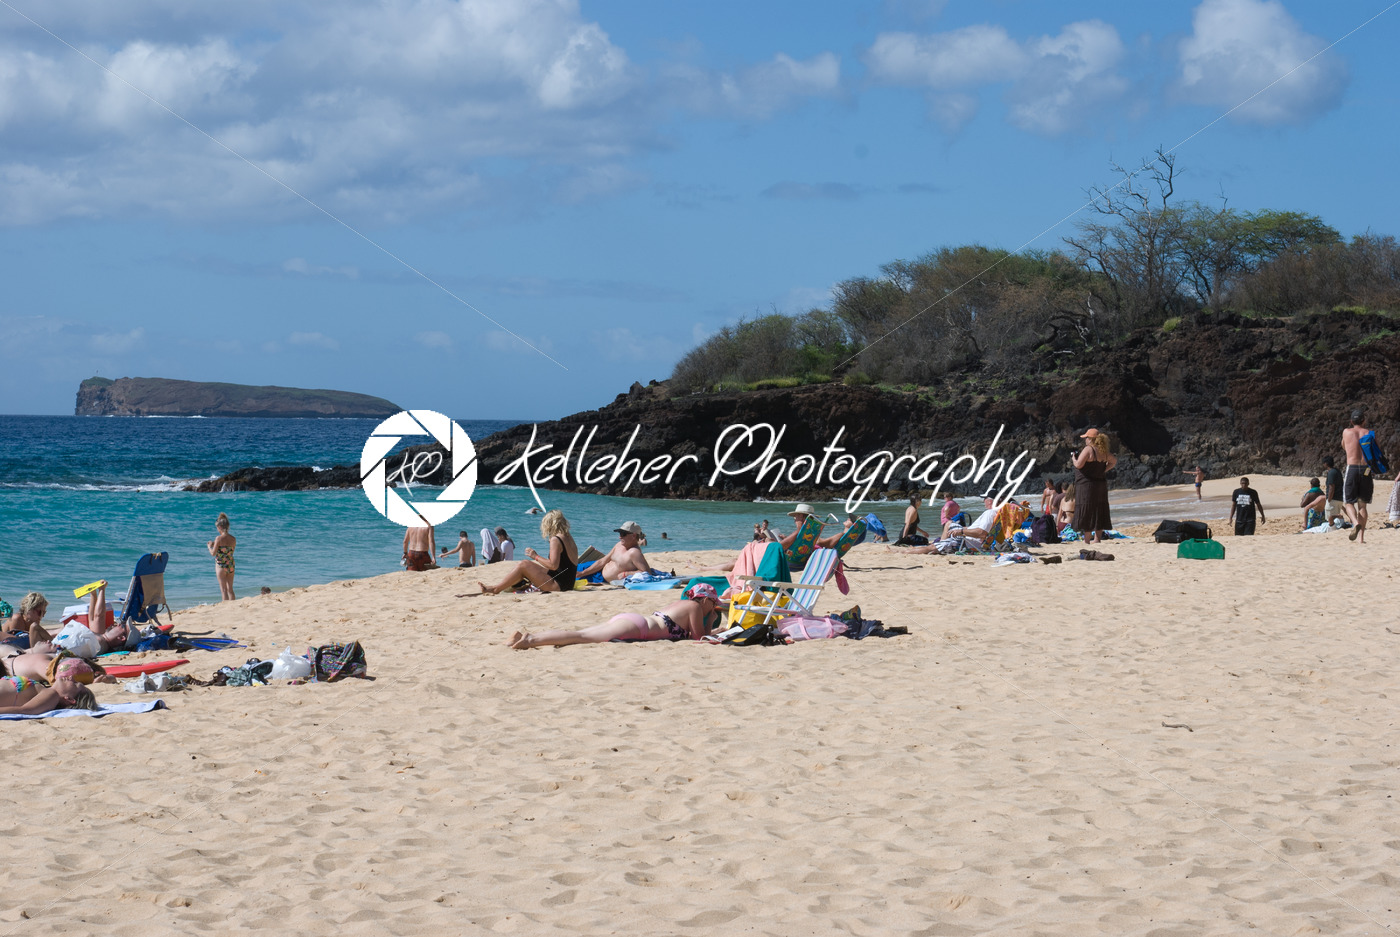 Beach Life At Mokapu Park On The Hawaiian Island Of Maui Kelleher Photography